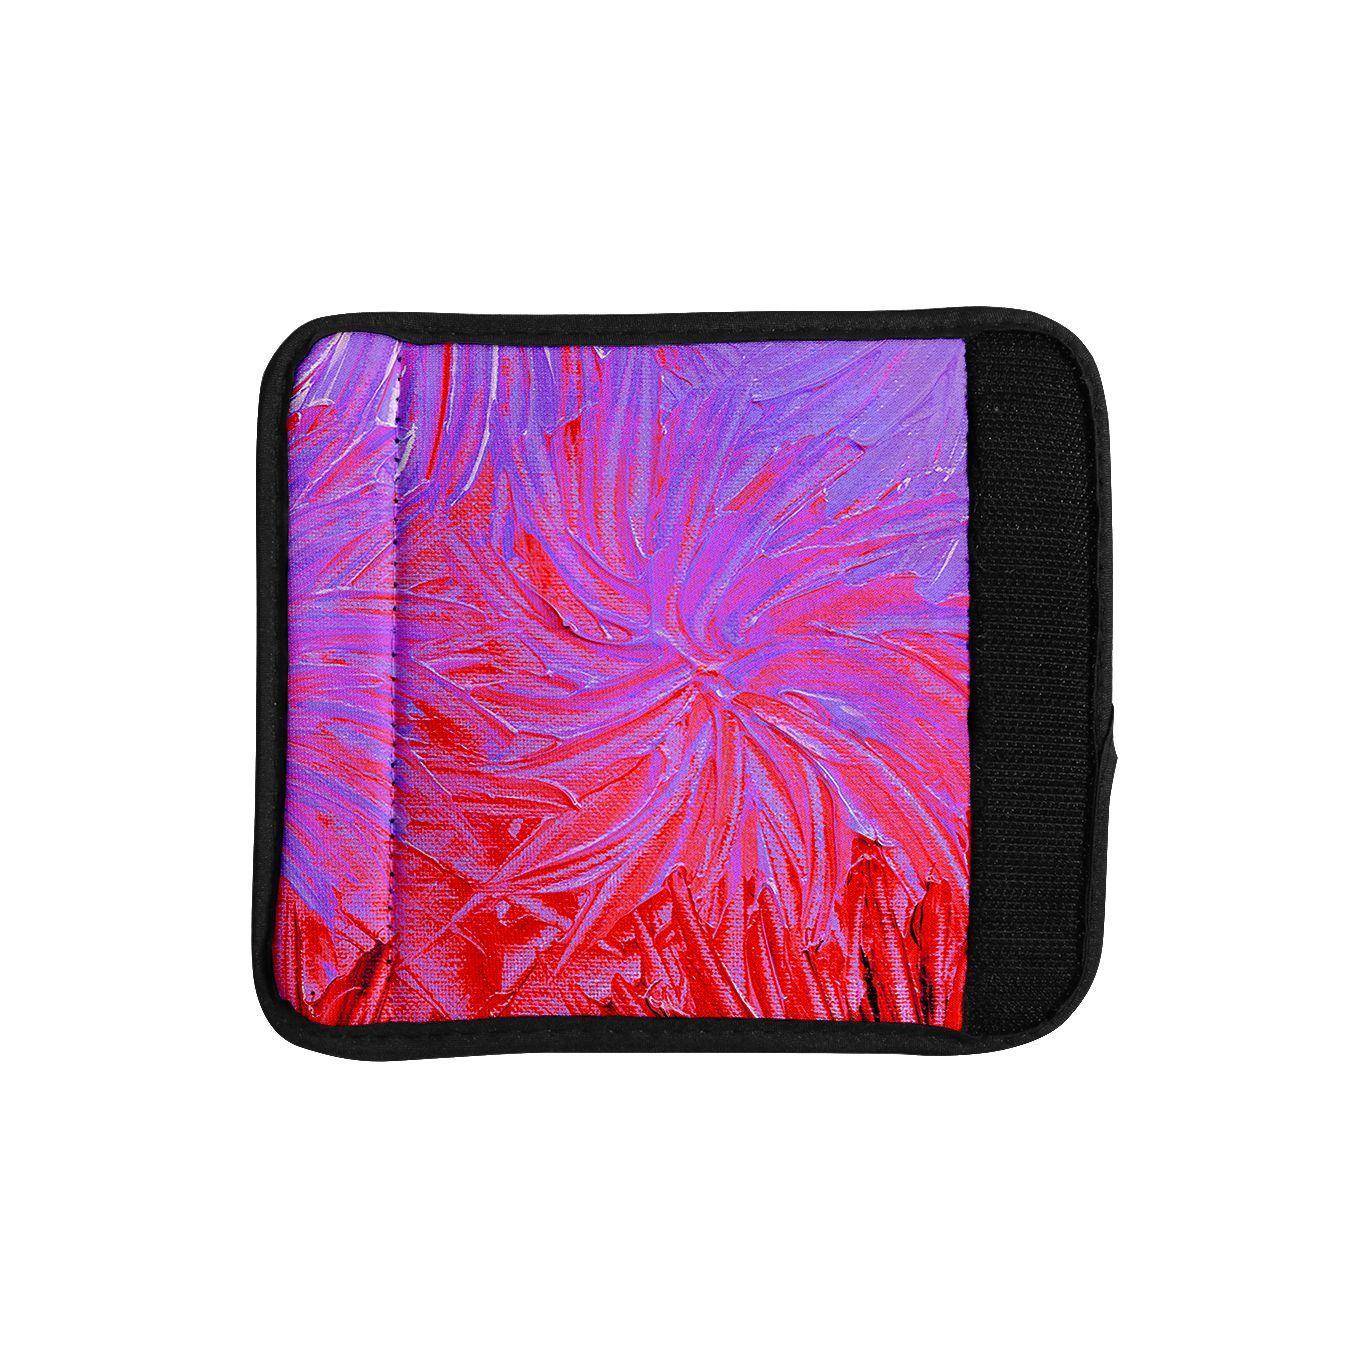 Kess InHouse Ebi Emporium 'Water Flowers Crimson Lilac' Red Luggage Handle Wrap